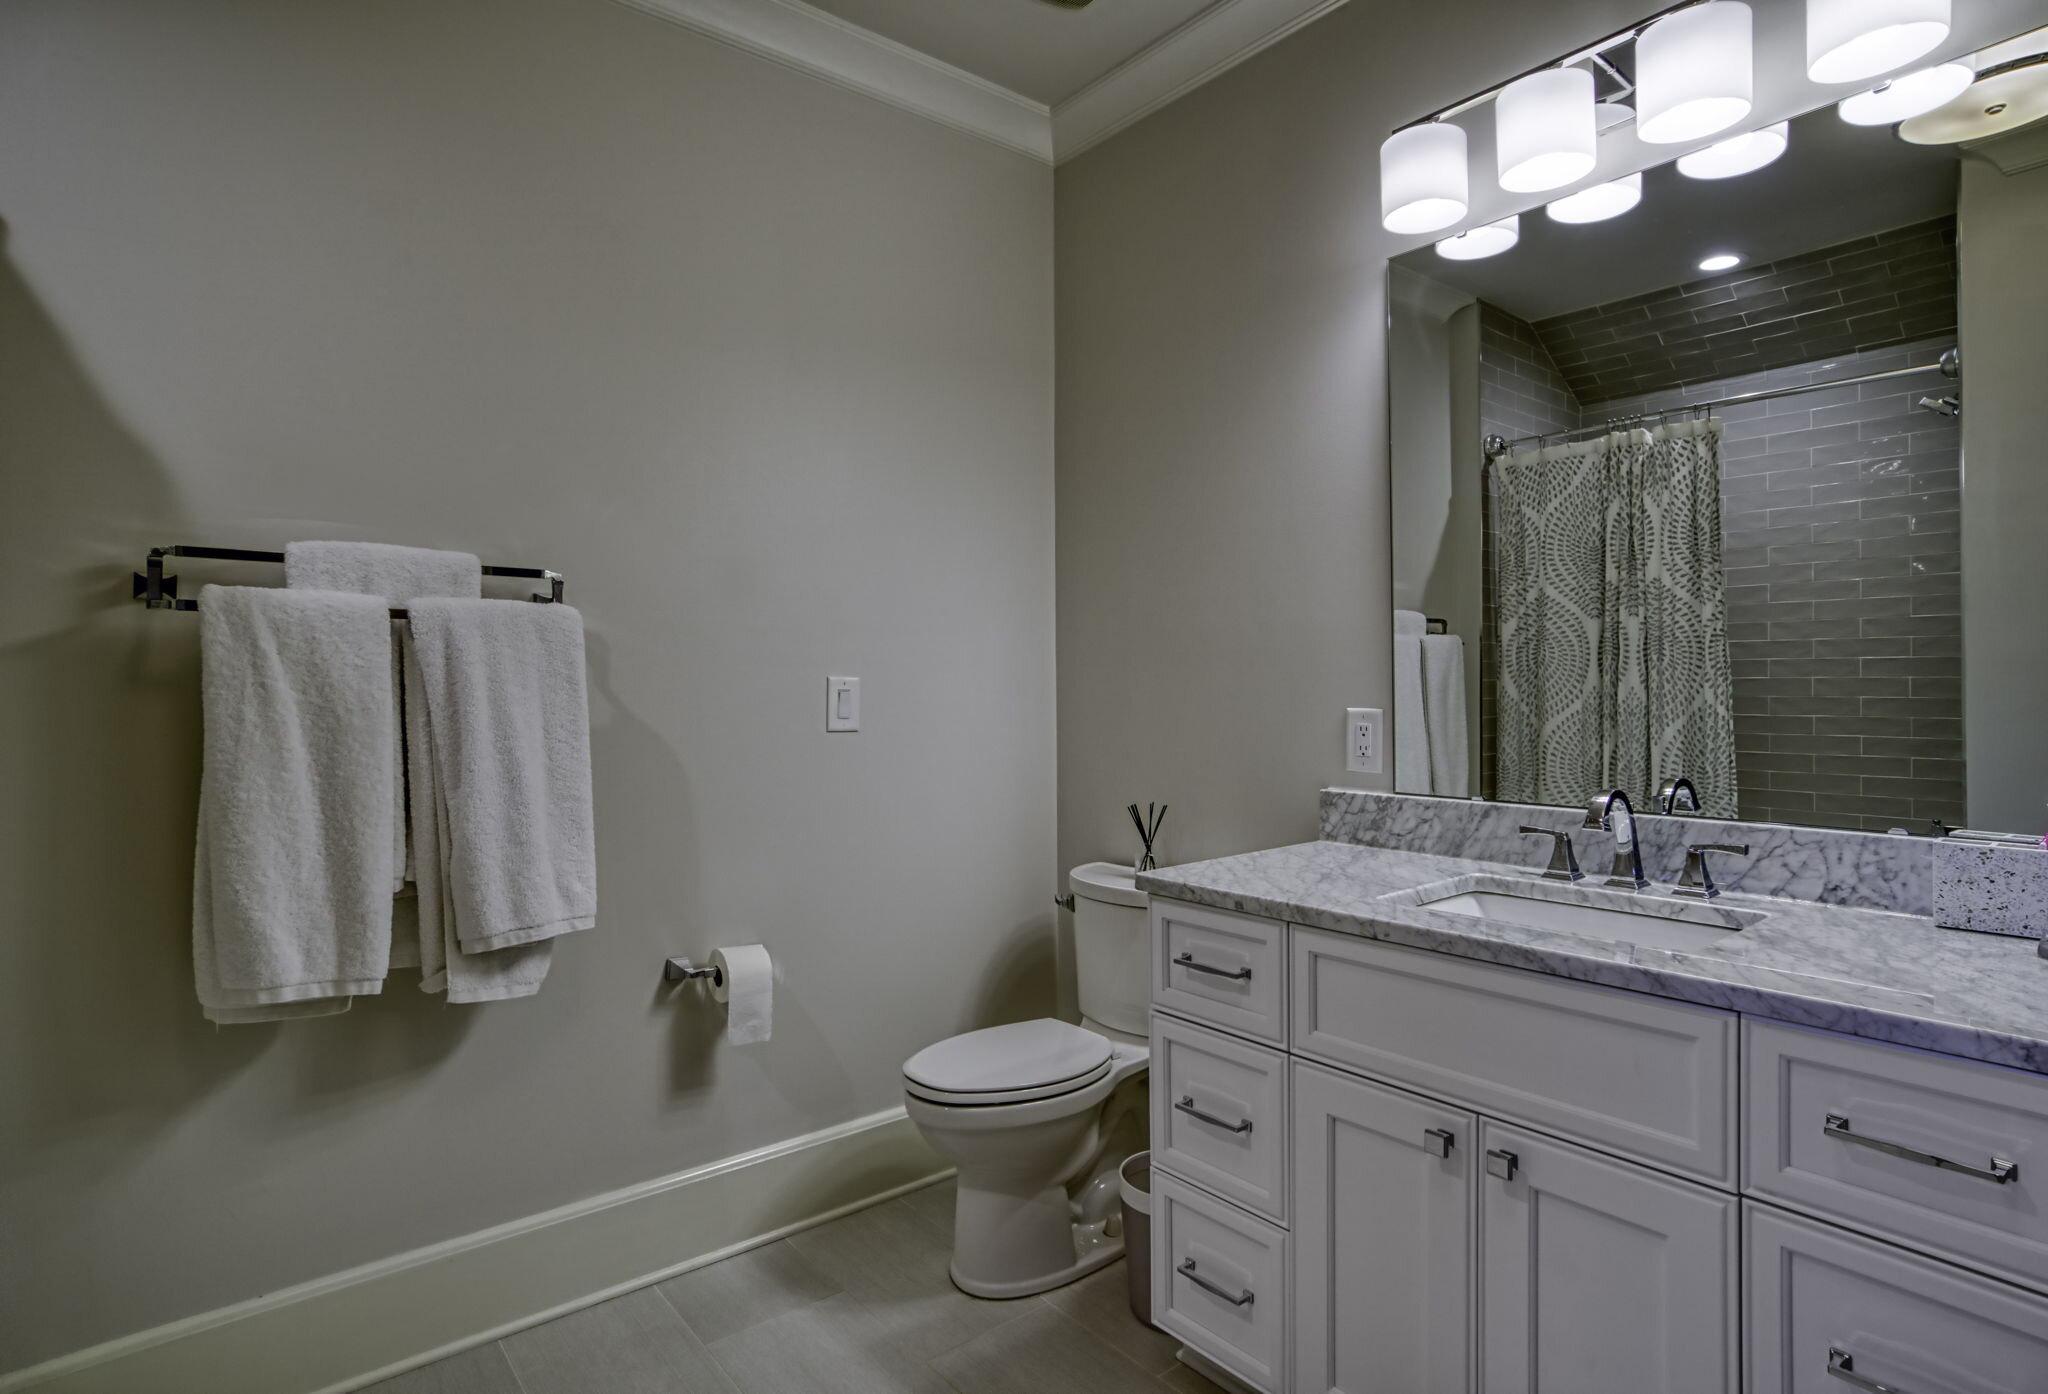 31-web-or-mls-4900 Carmel Park Dr Bedroom Bath 1.jpg